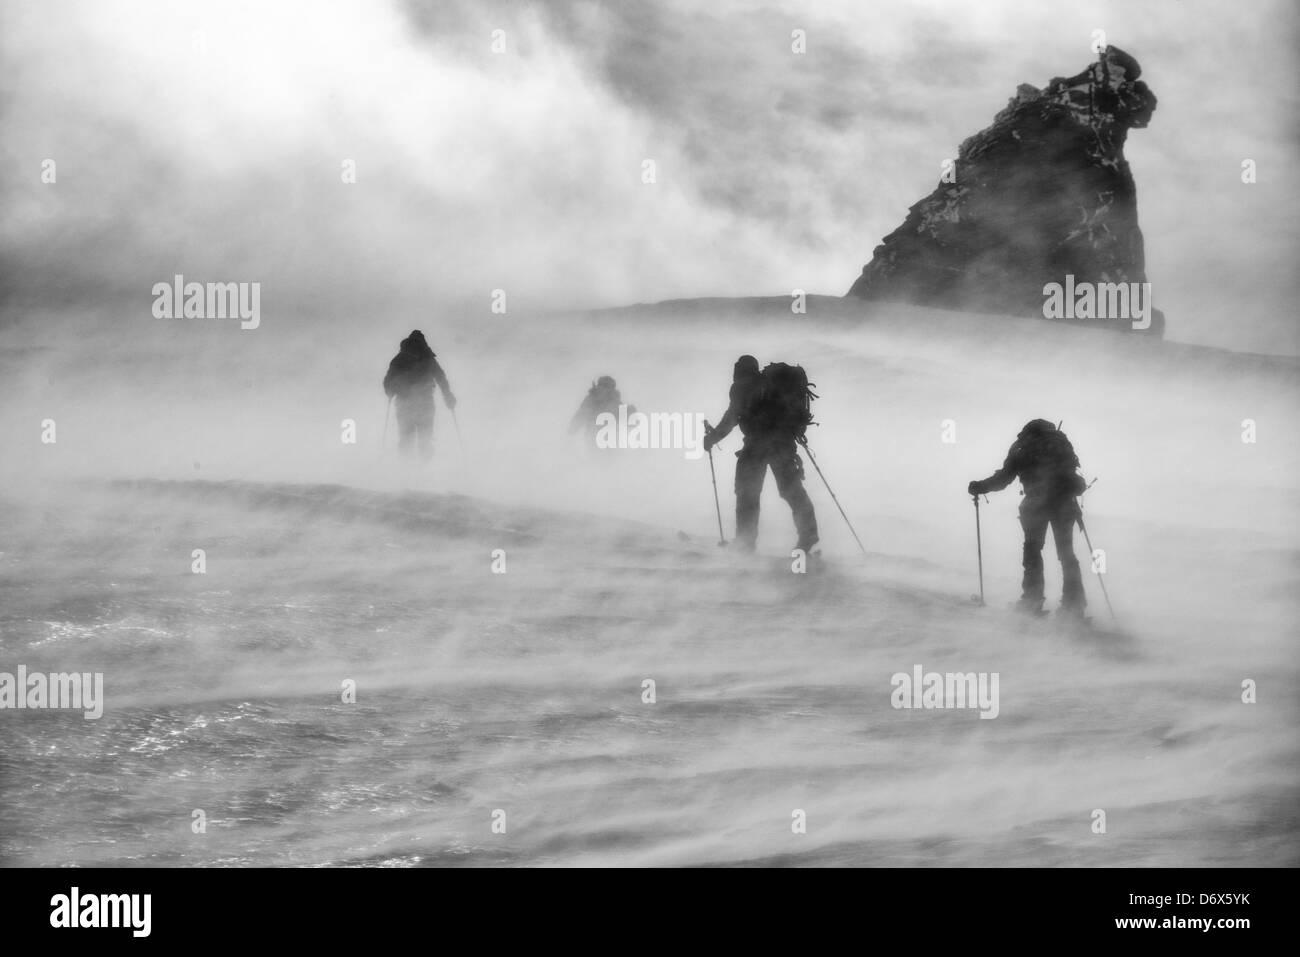 A windy morning ski touring on the Gran Paradiso Stock Photo